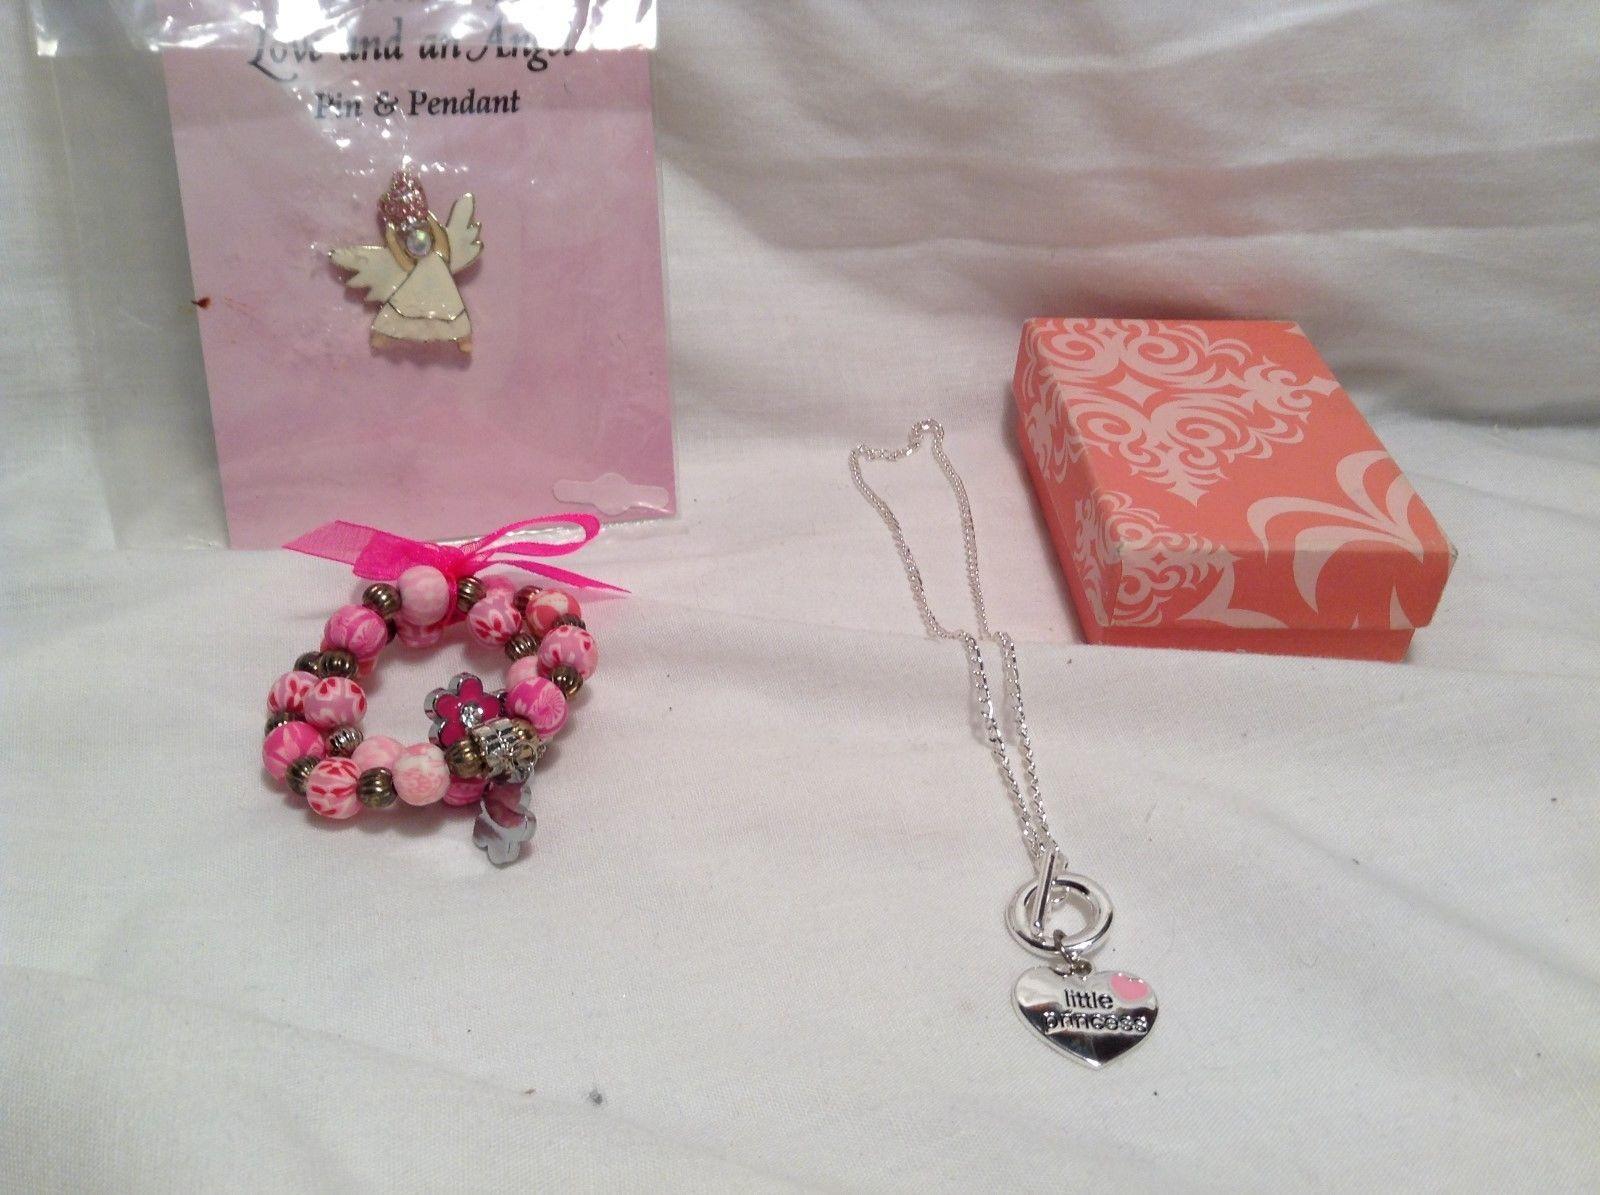 NEW Angel Pendant Childs Jewelry Set